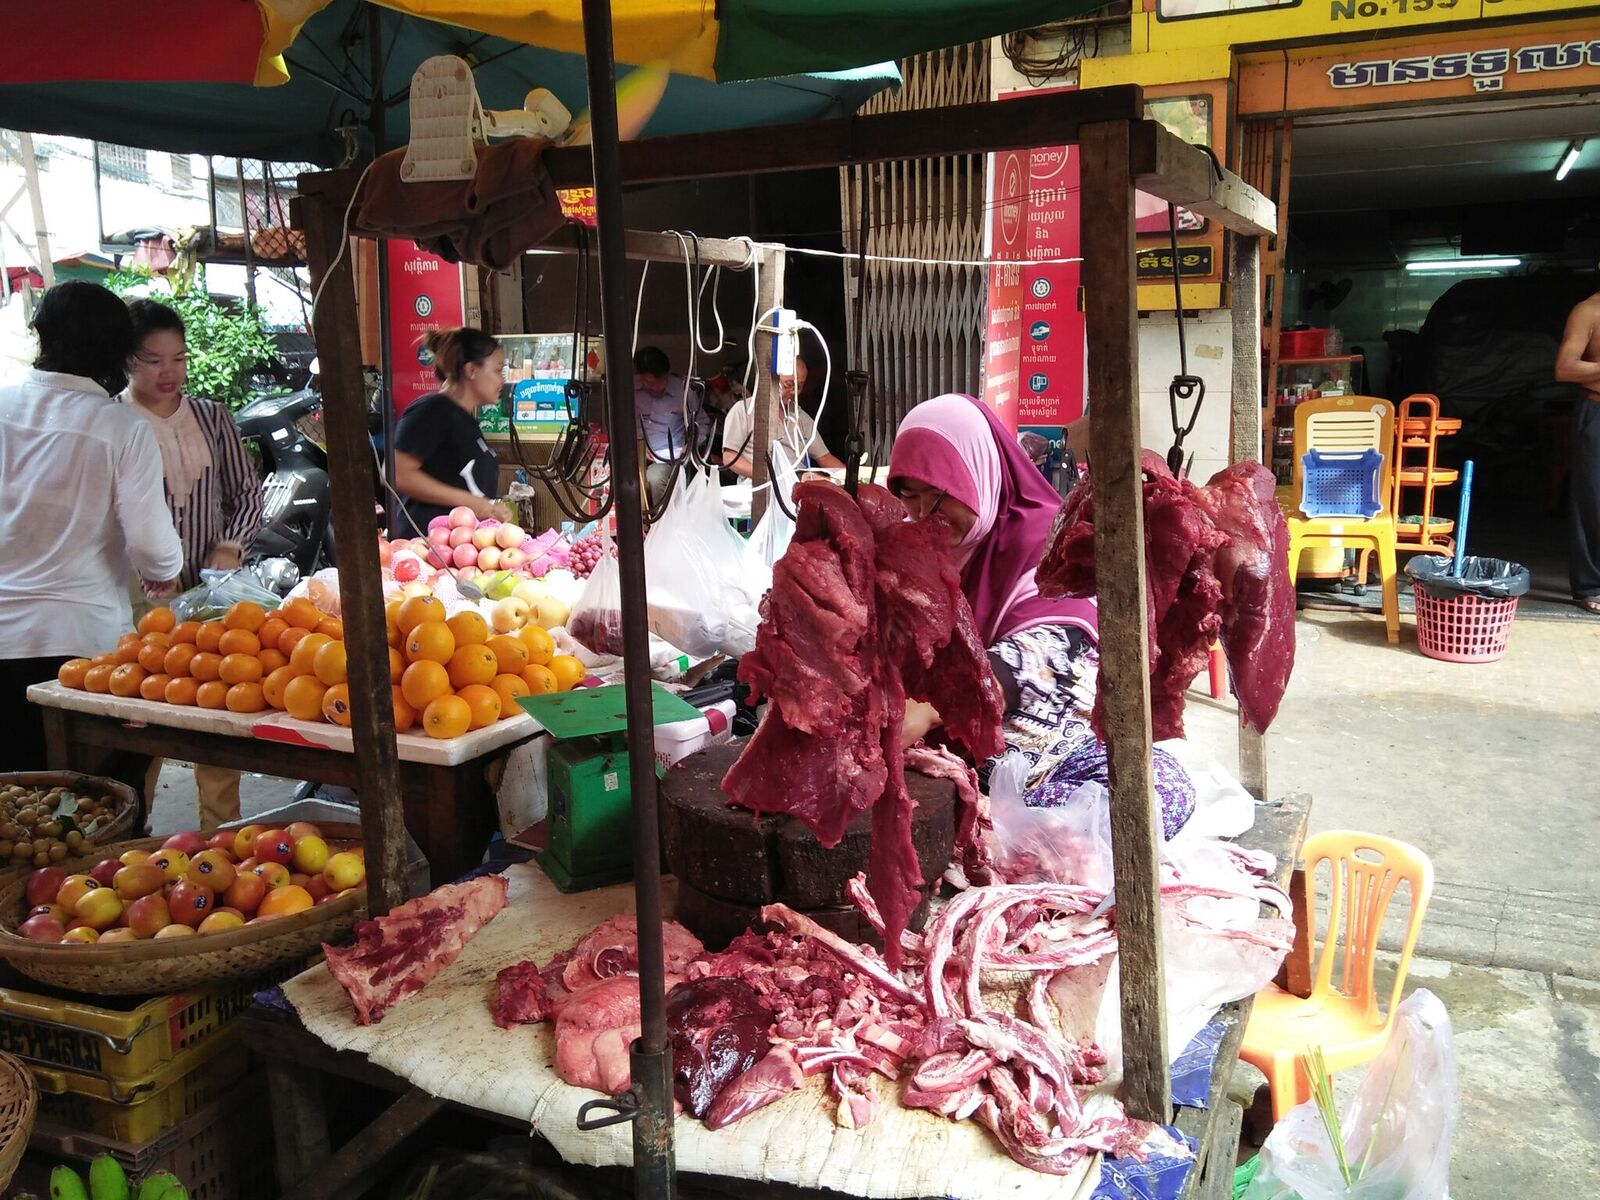 Makara market in Phnom Penh, Cambodia (photo credit: ILRI/Hardisman Dasman).